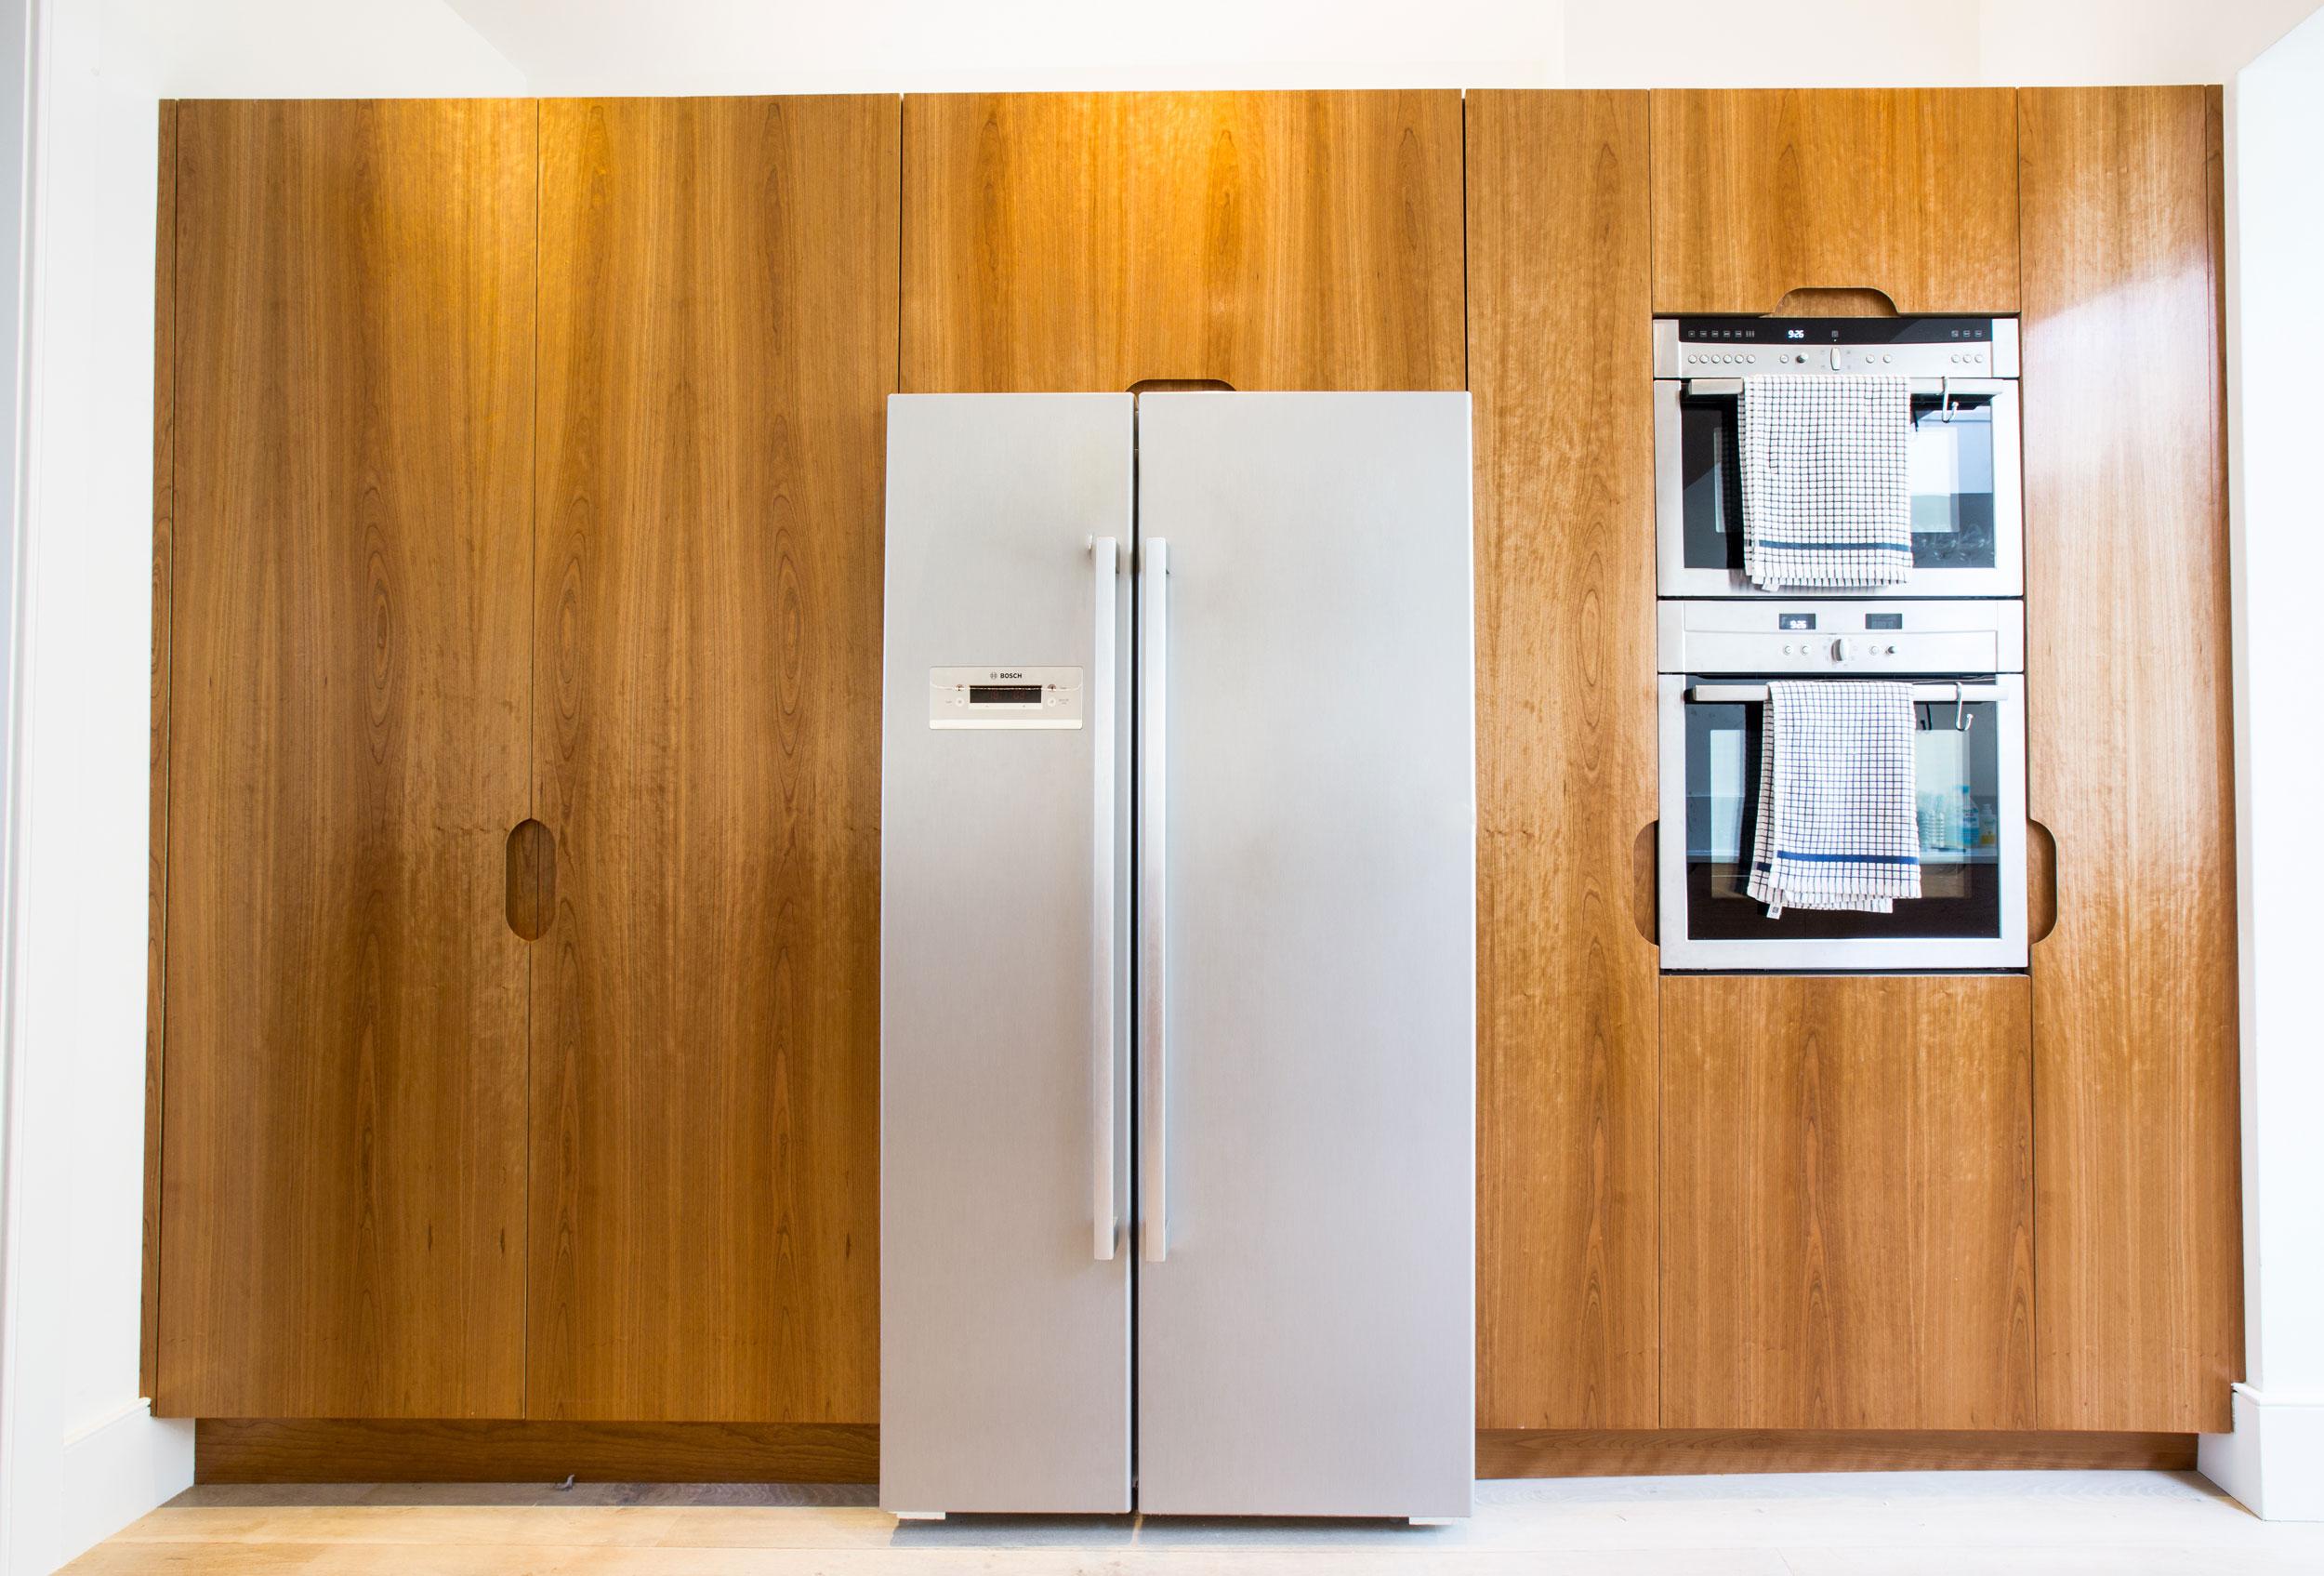 cherry walnut design, bespoke kitchen, cupboards, London, west and reid